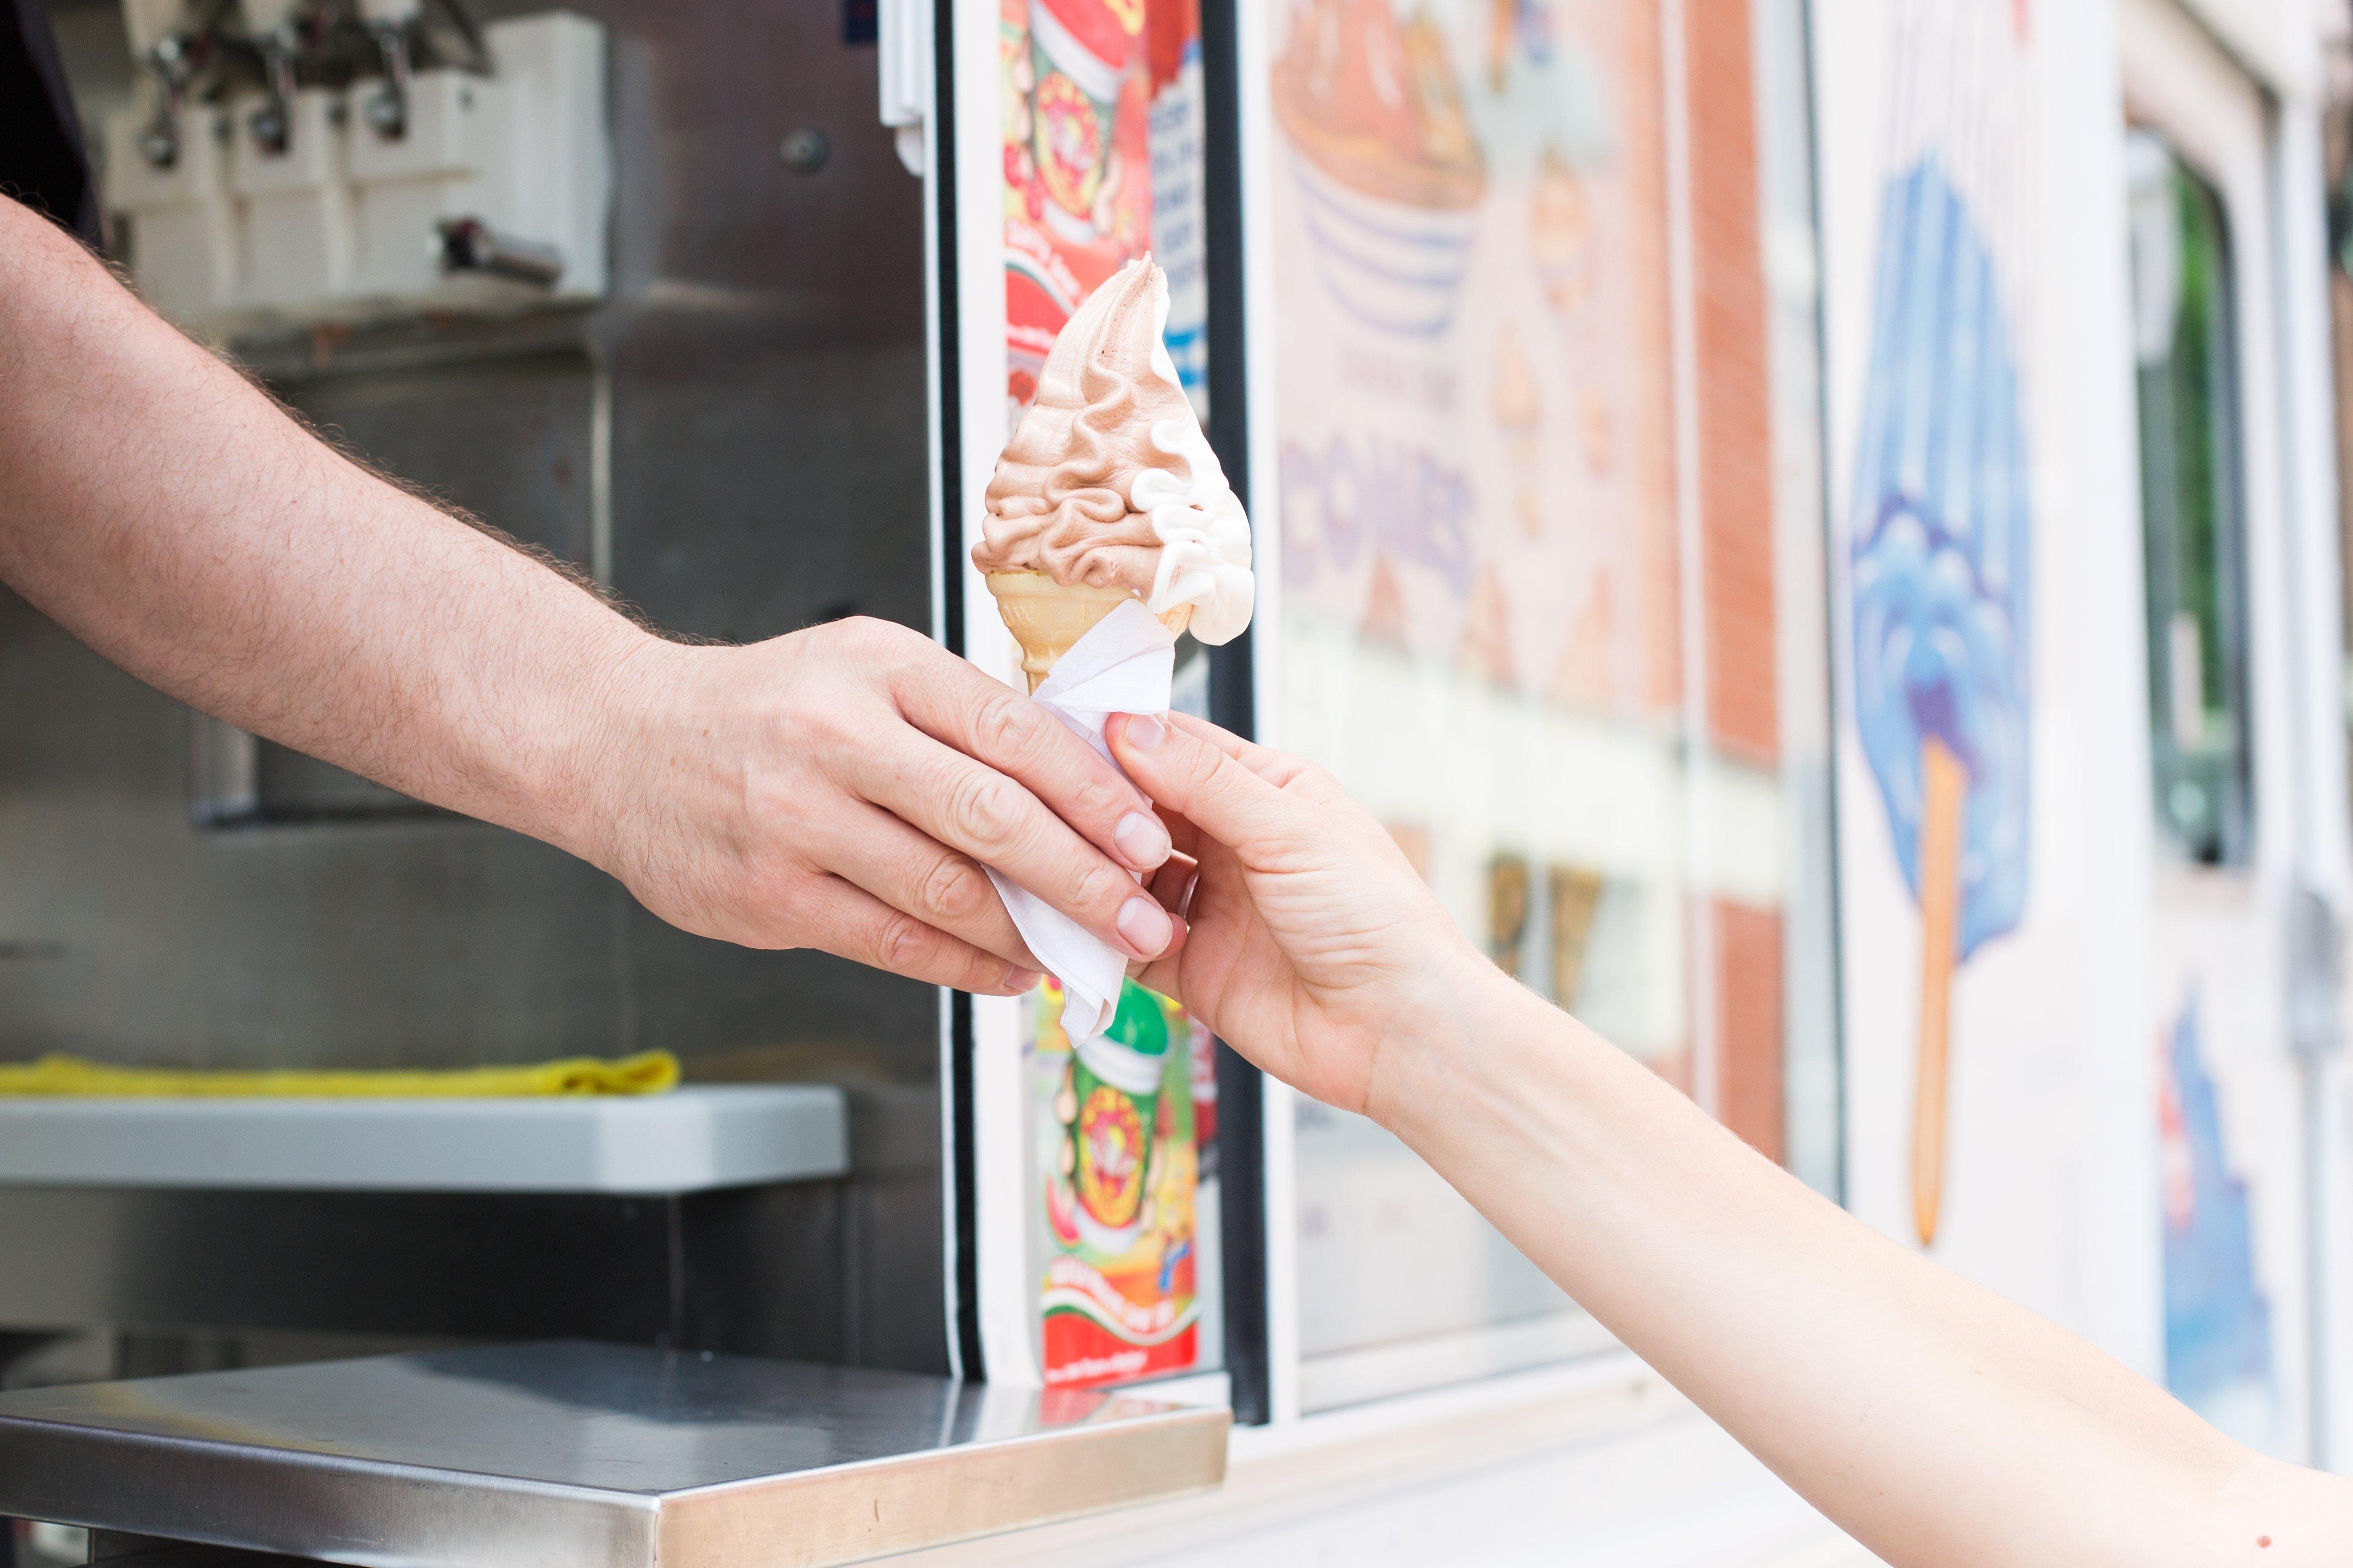 ice-cream-truck_4460x4460.jpg